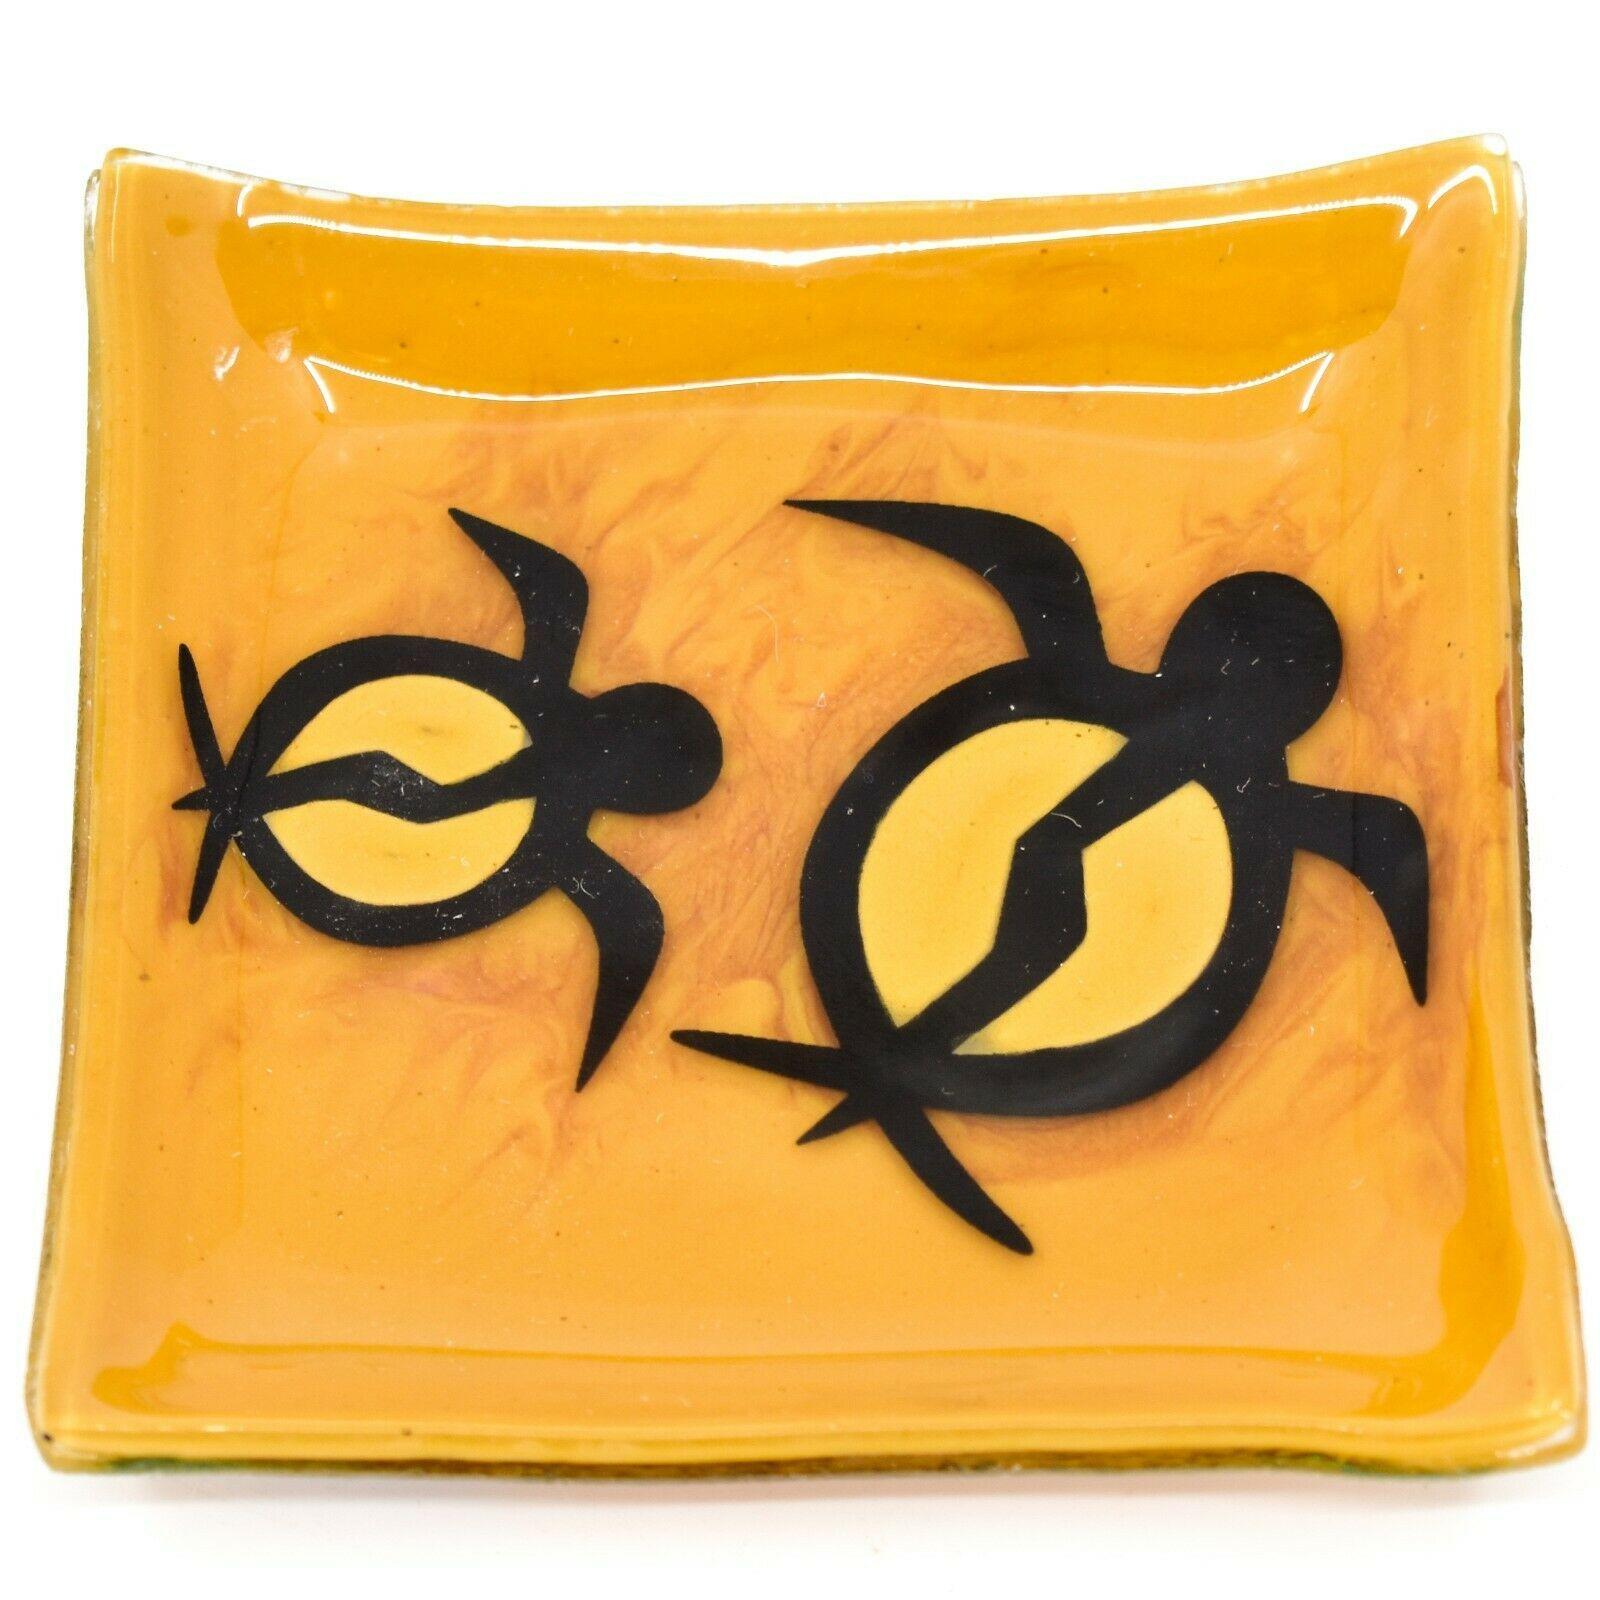 Fused Art Glass Honu Sea Turtle Design Soap Dish Handmade Ecuador